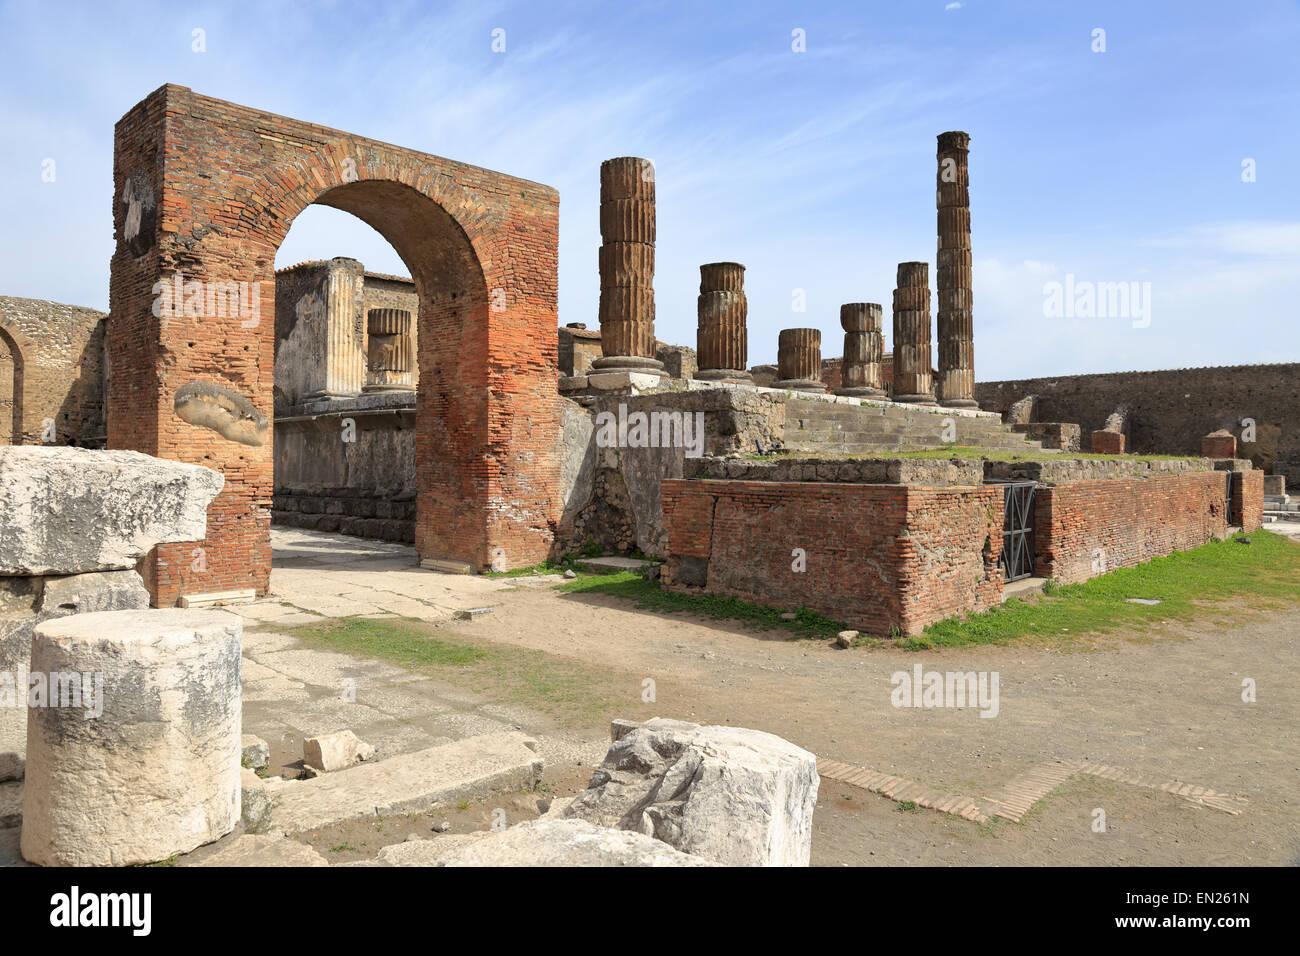 Bogen und Tempel des Jupiter im Forum, Pompeji, Italien. Stockbild